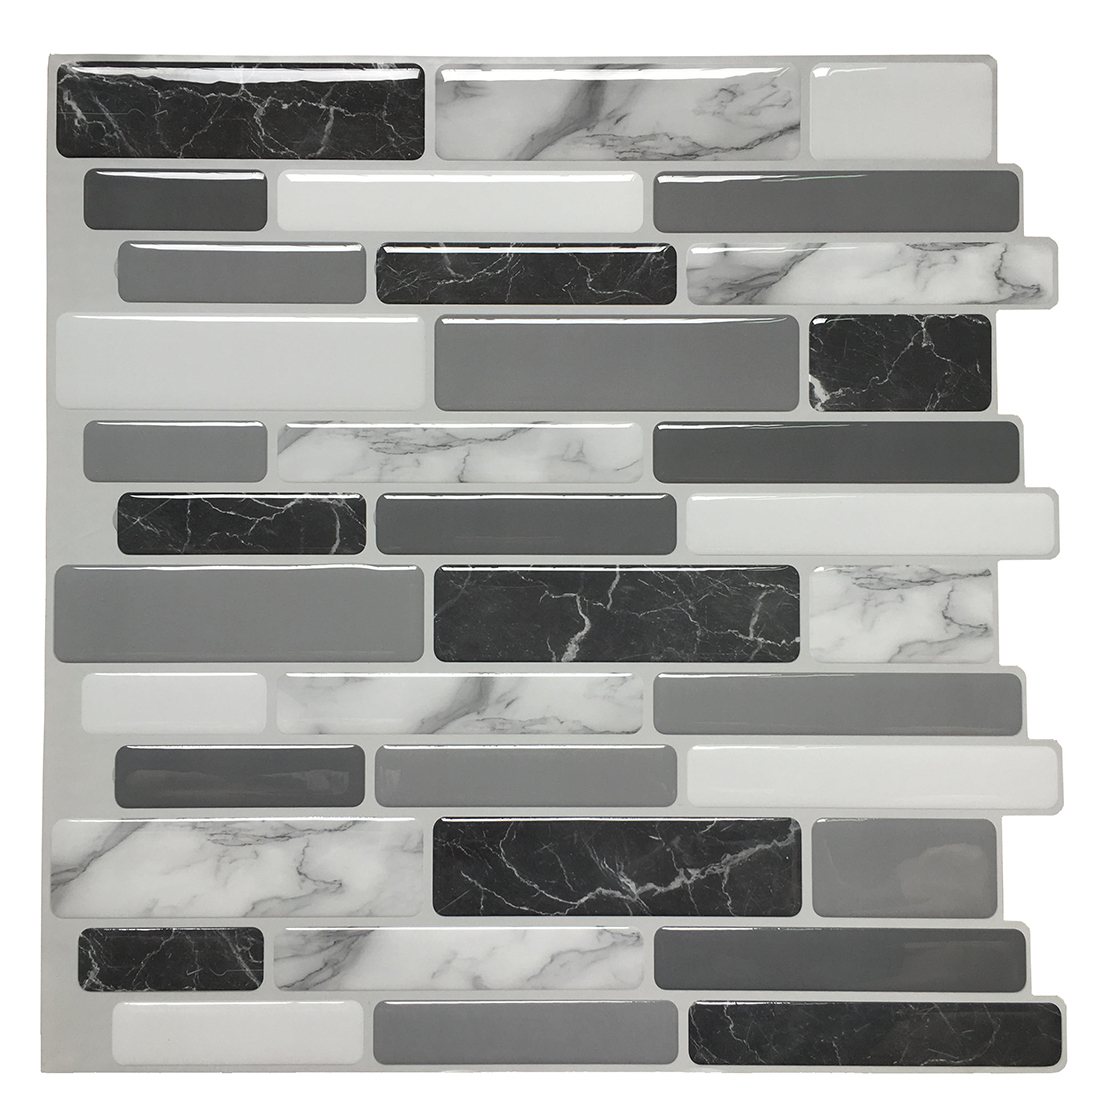 "Art3d 6-Pack Marble Peel and Stick Backsplash Tiles 12""x12"" Kitchen Backsplash Premium Vinyl Wall Stickers"